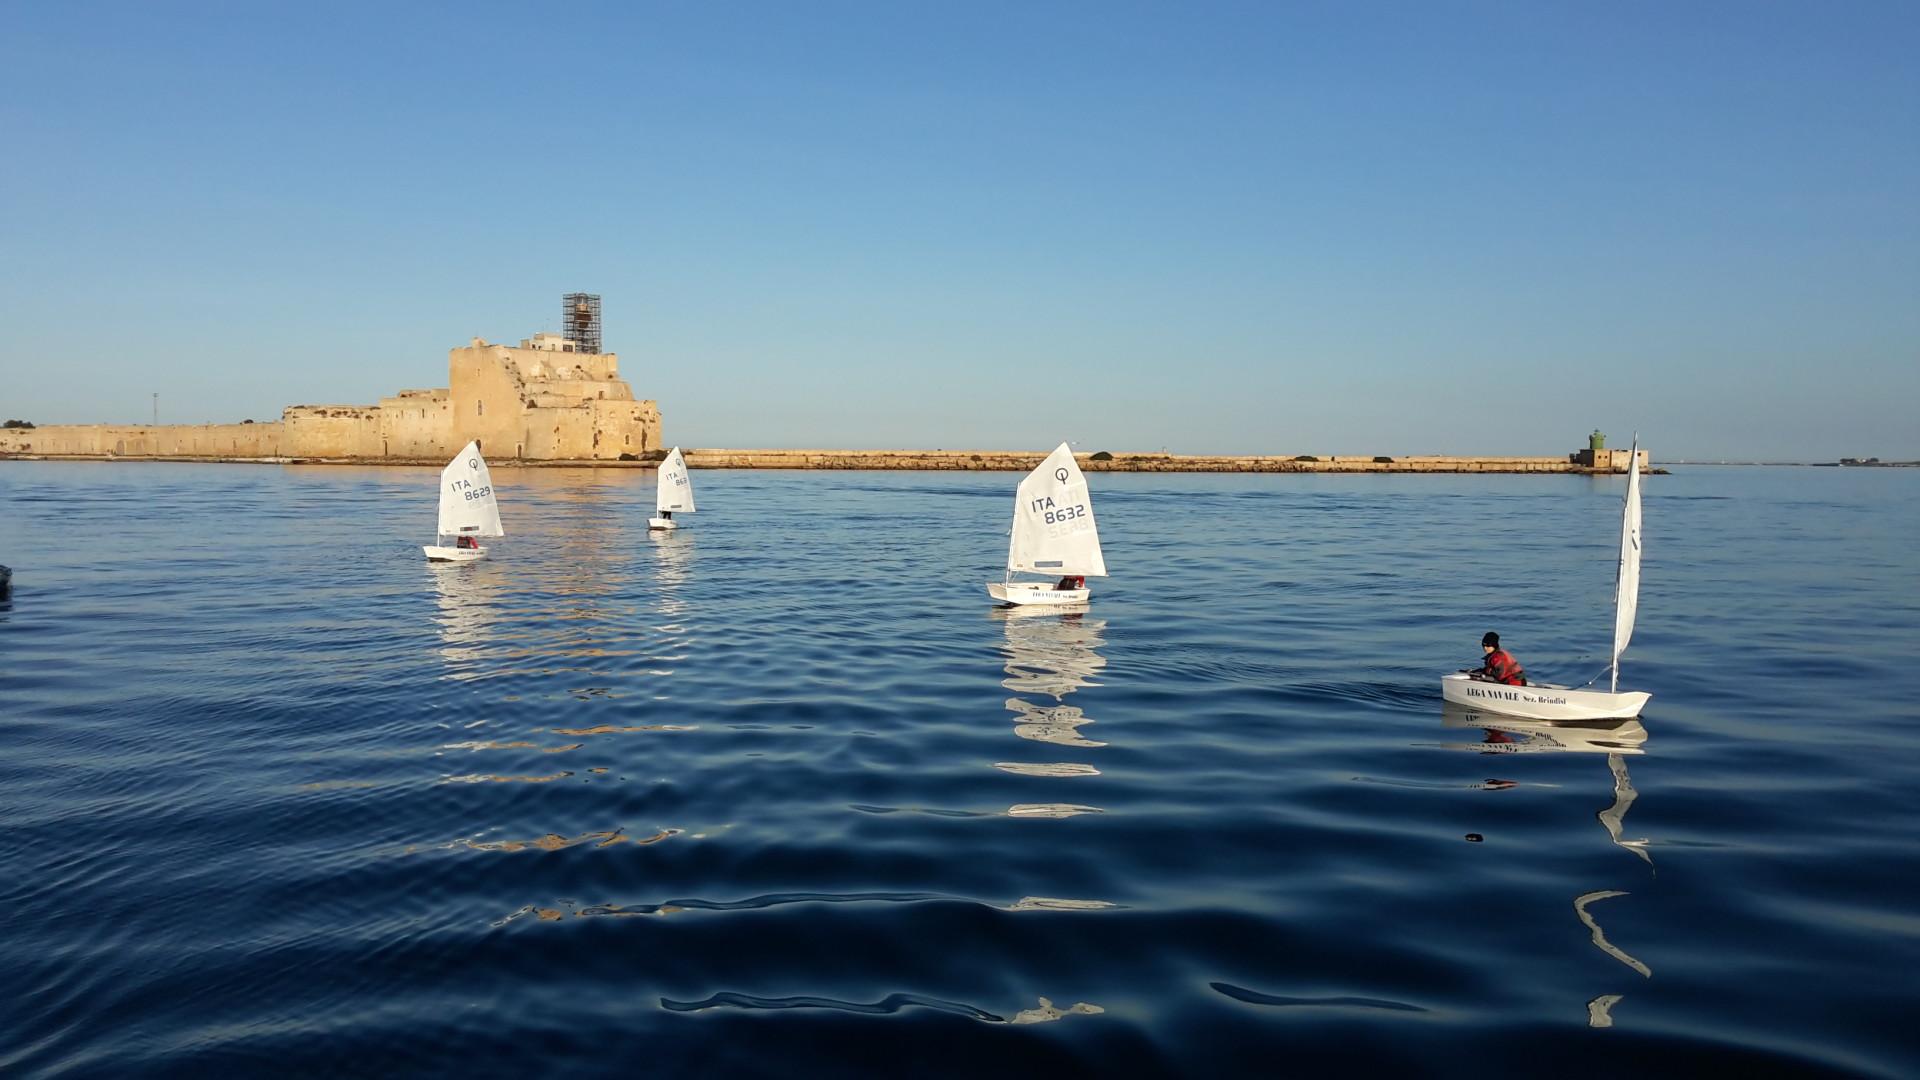 Scuola-di-vela-lega-navale-LNI-Brindisi (12)